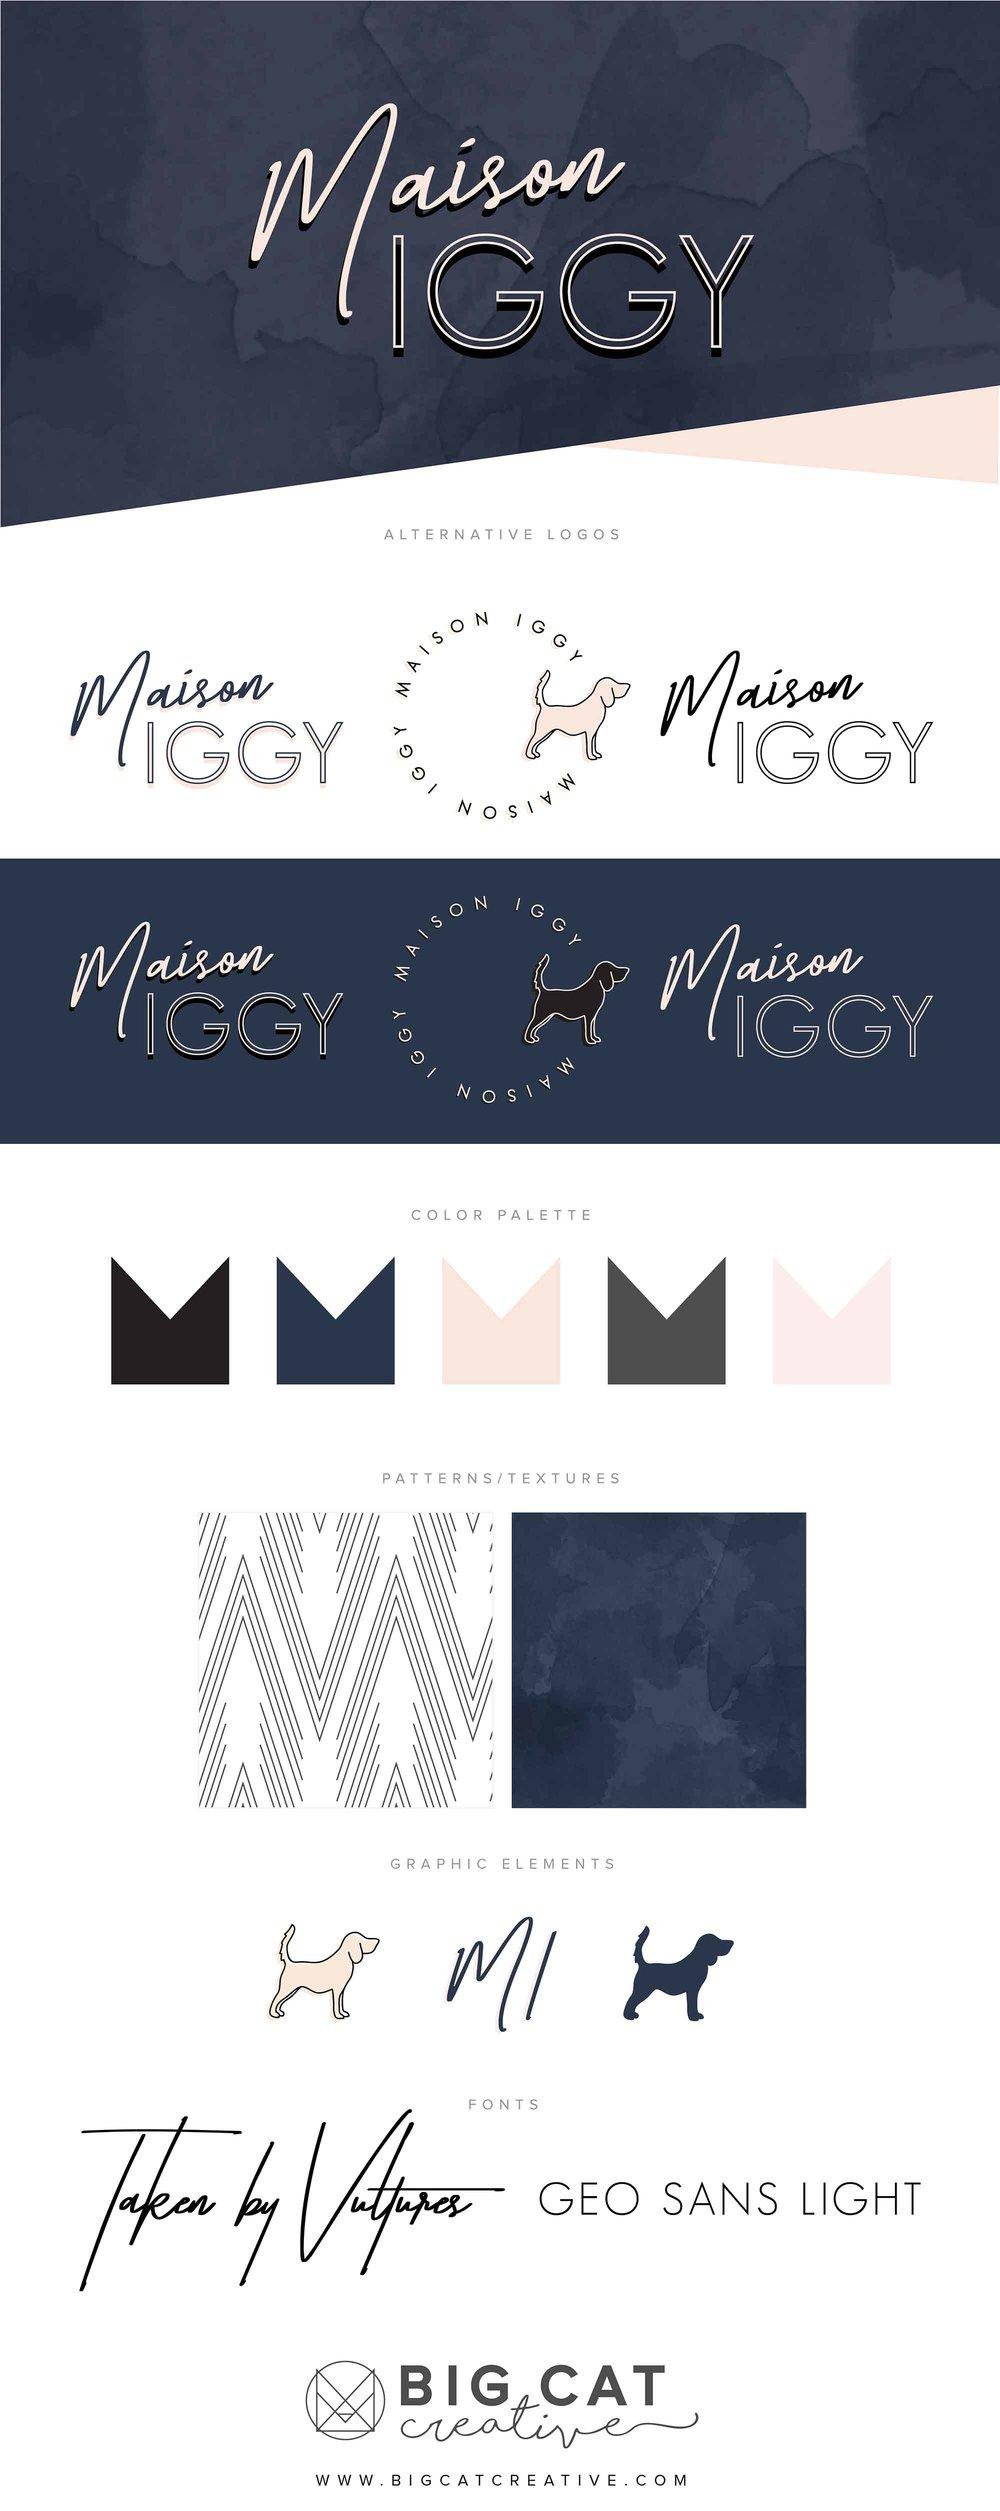 Maison-Iggy-Branding-Style-Board.jpg